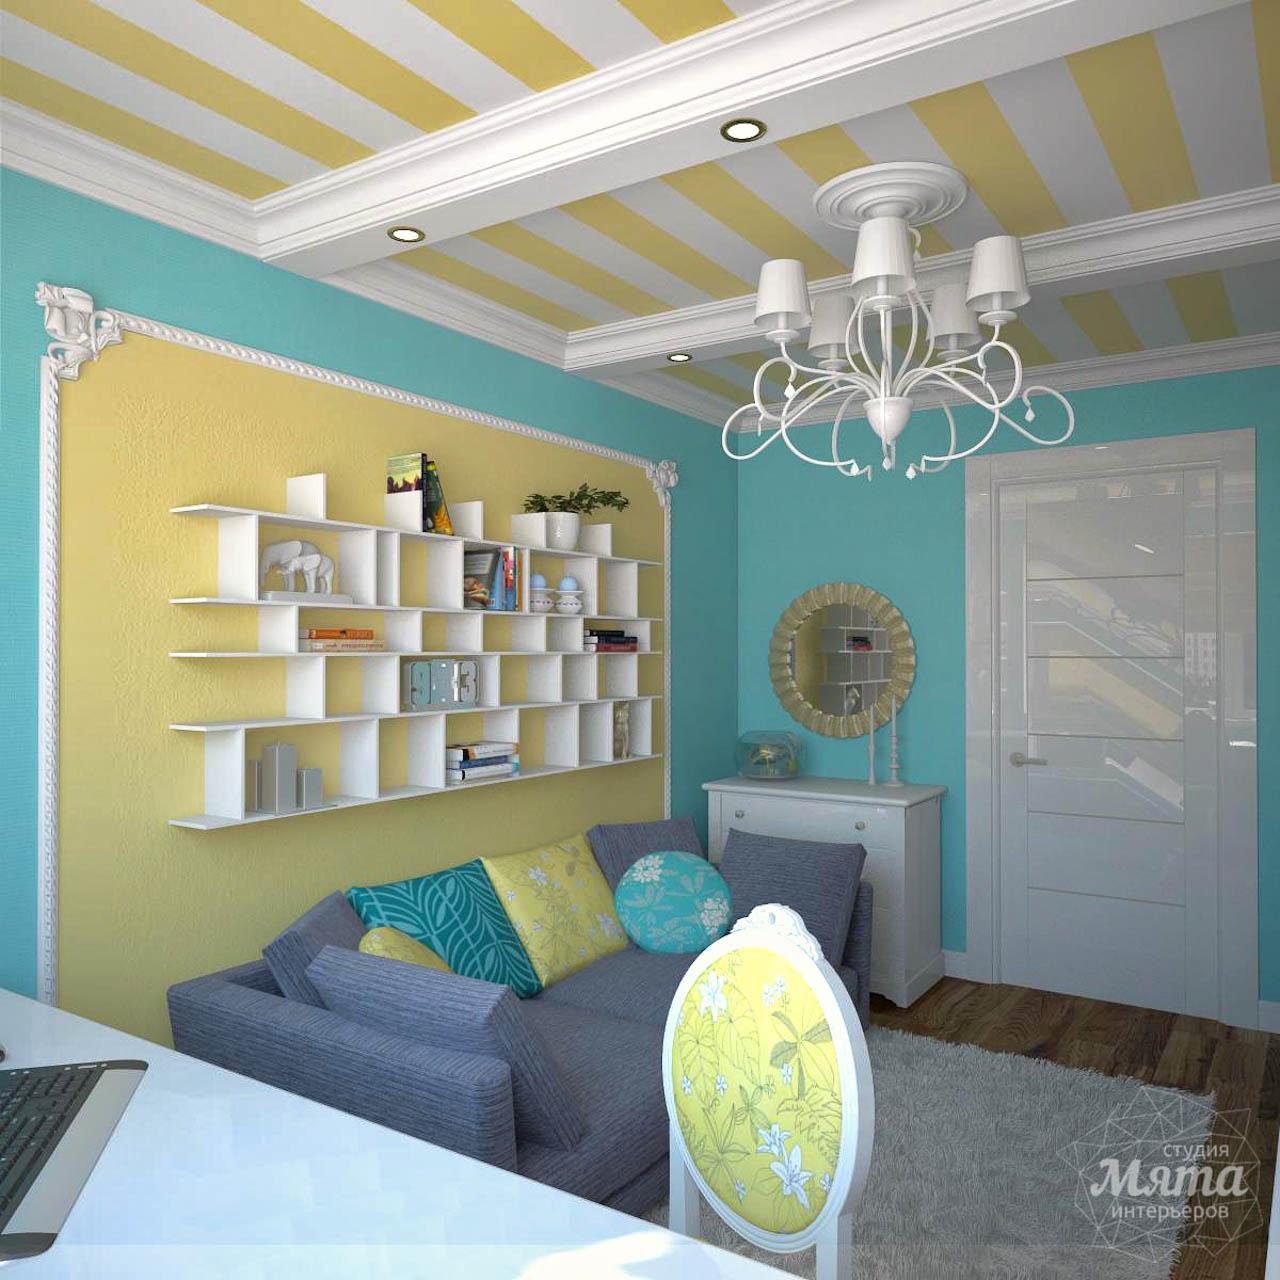 Дизайн интерьера двухкомнатной квартиры по ул. Комсомольская 14 img1716700043